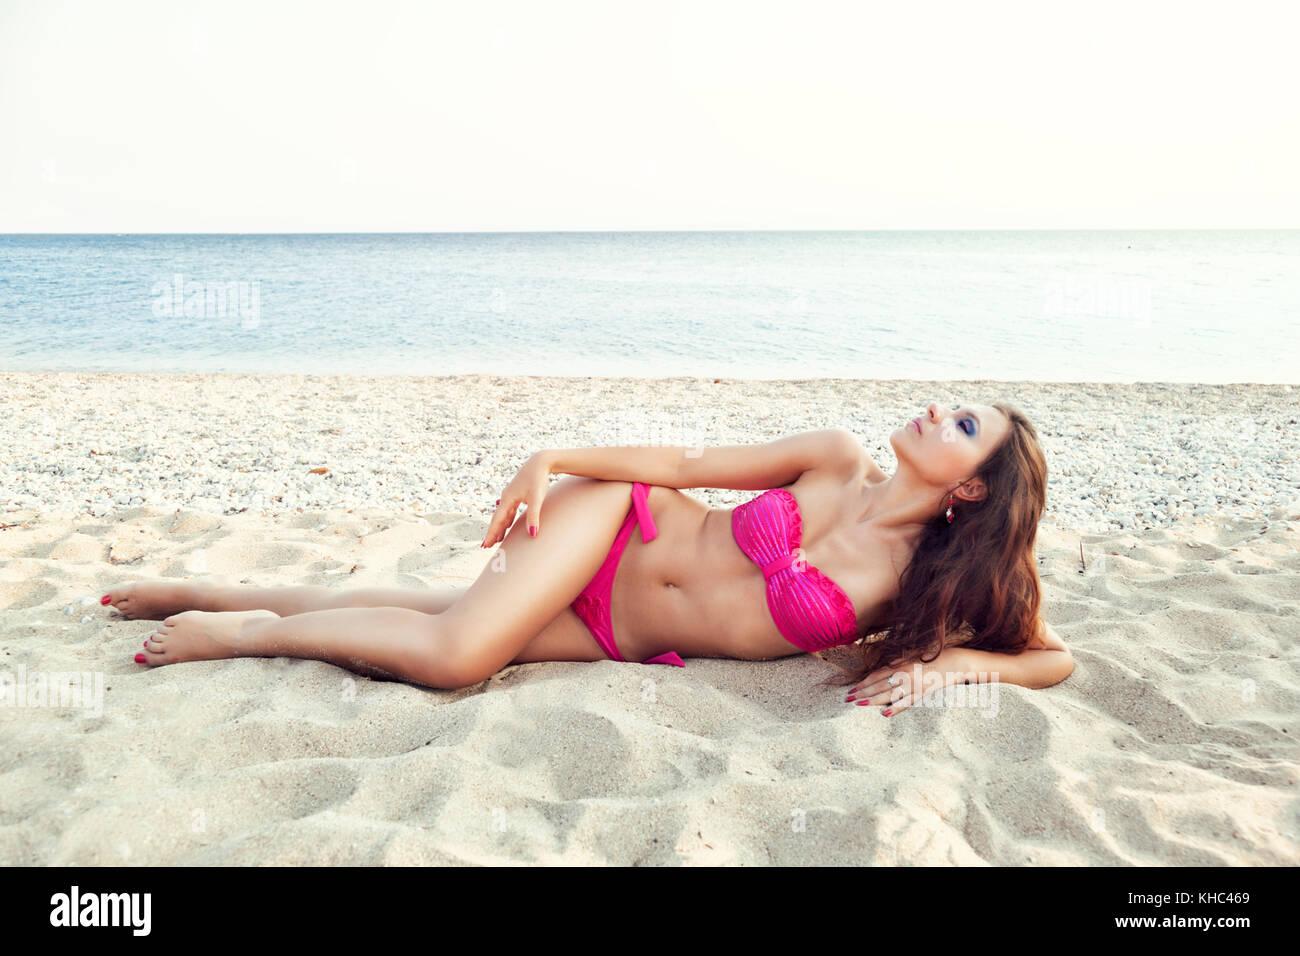 643677319f0 Girl in hot pink bikini on beautiful white sandy beach. - Stock Image